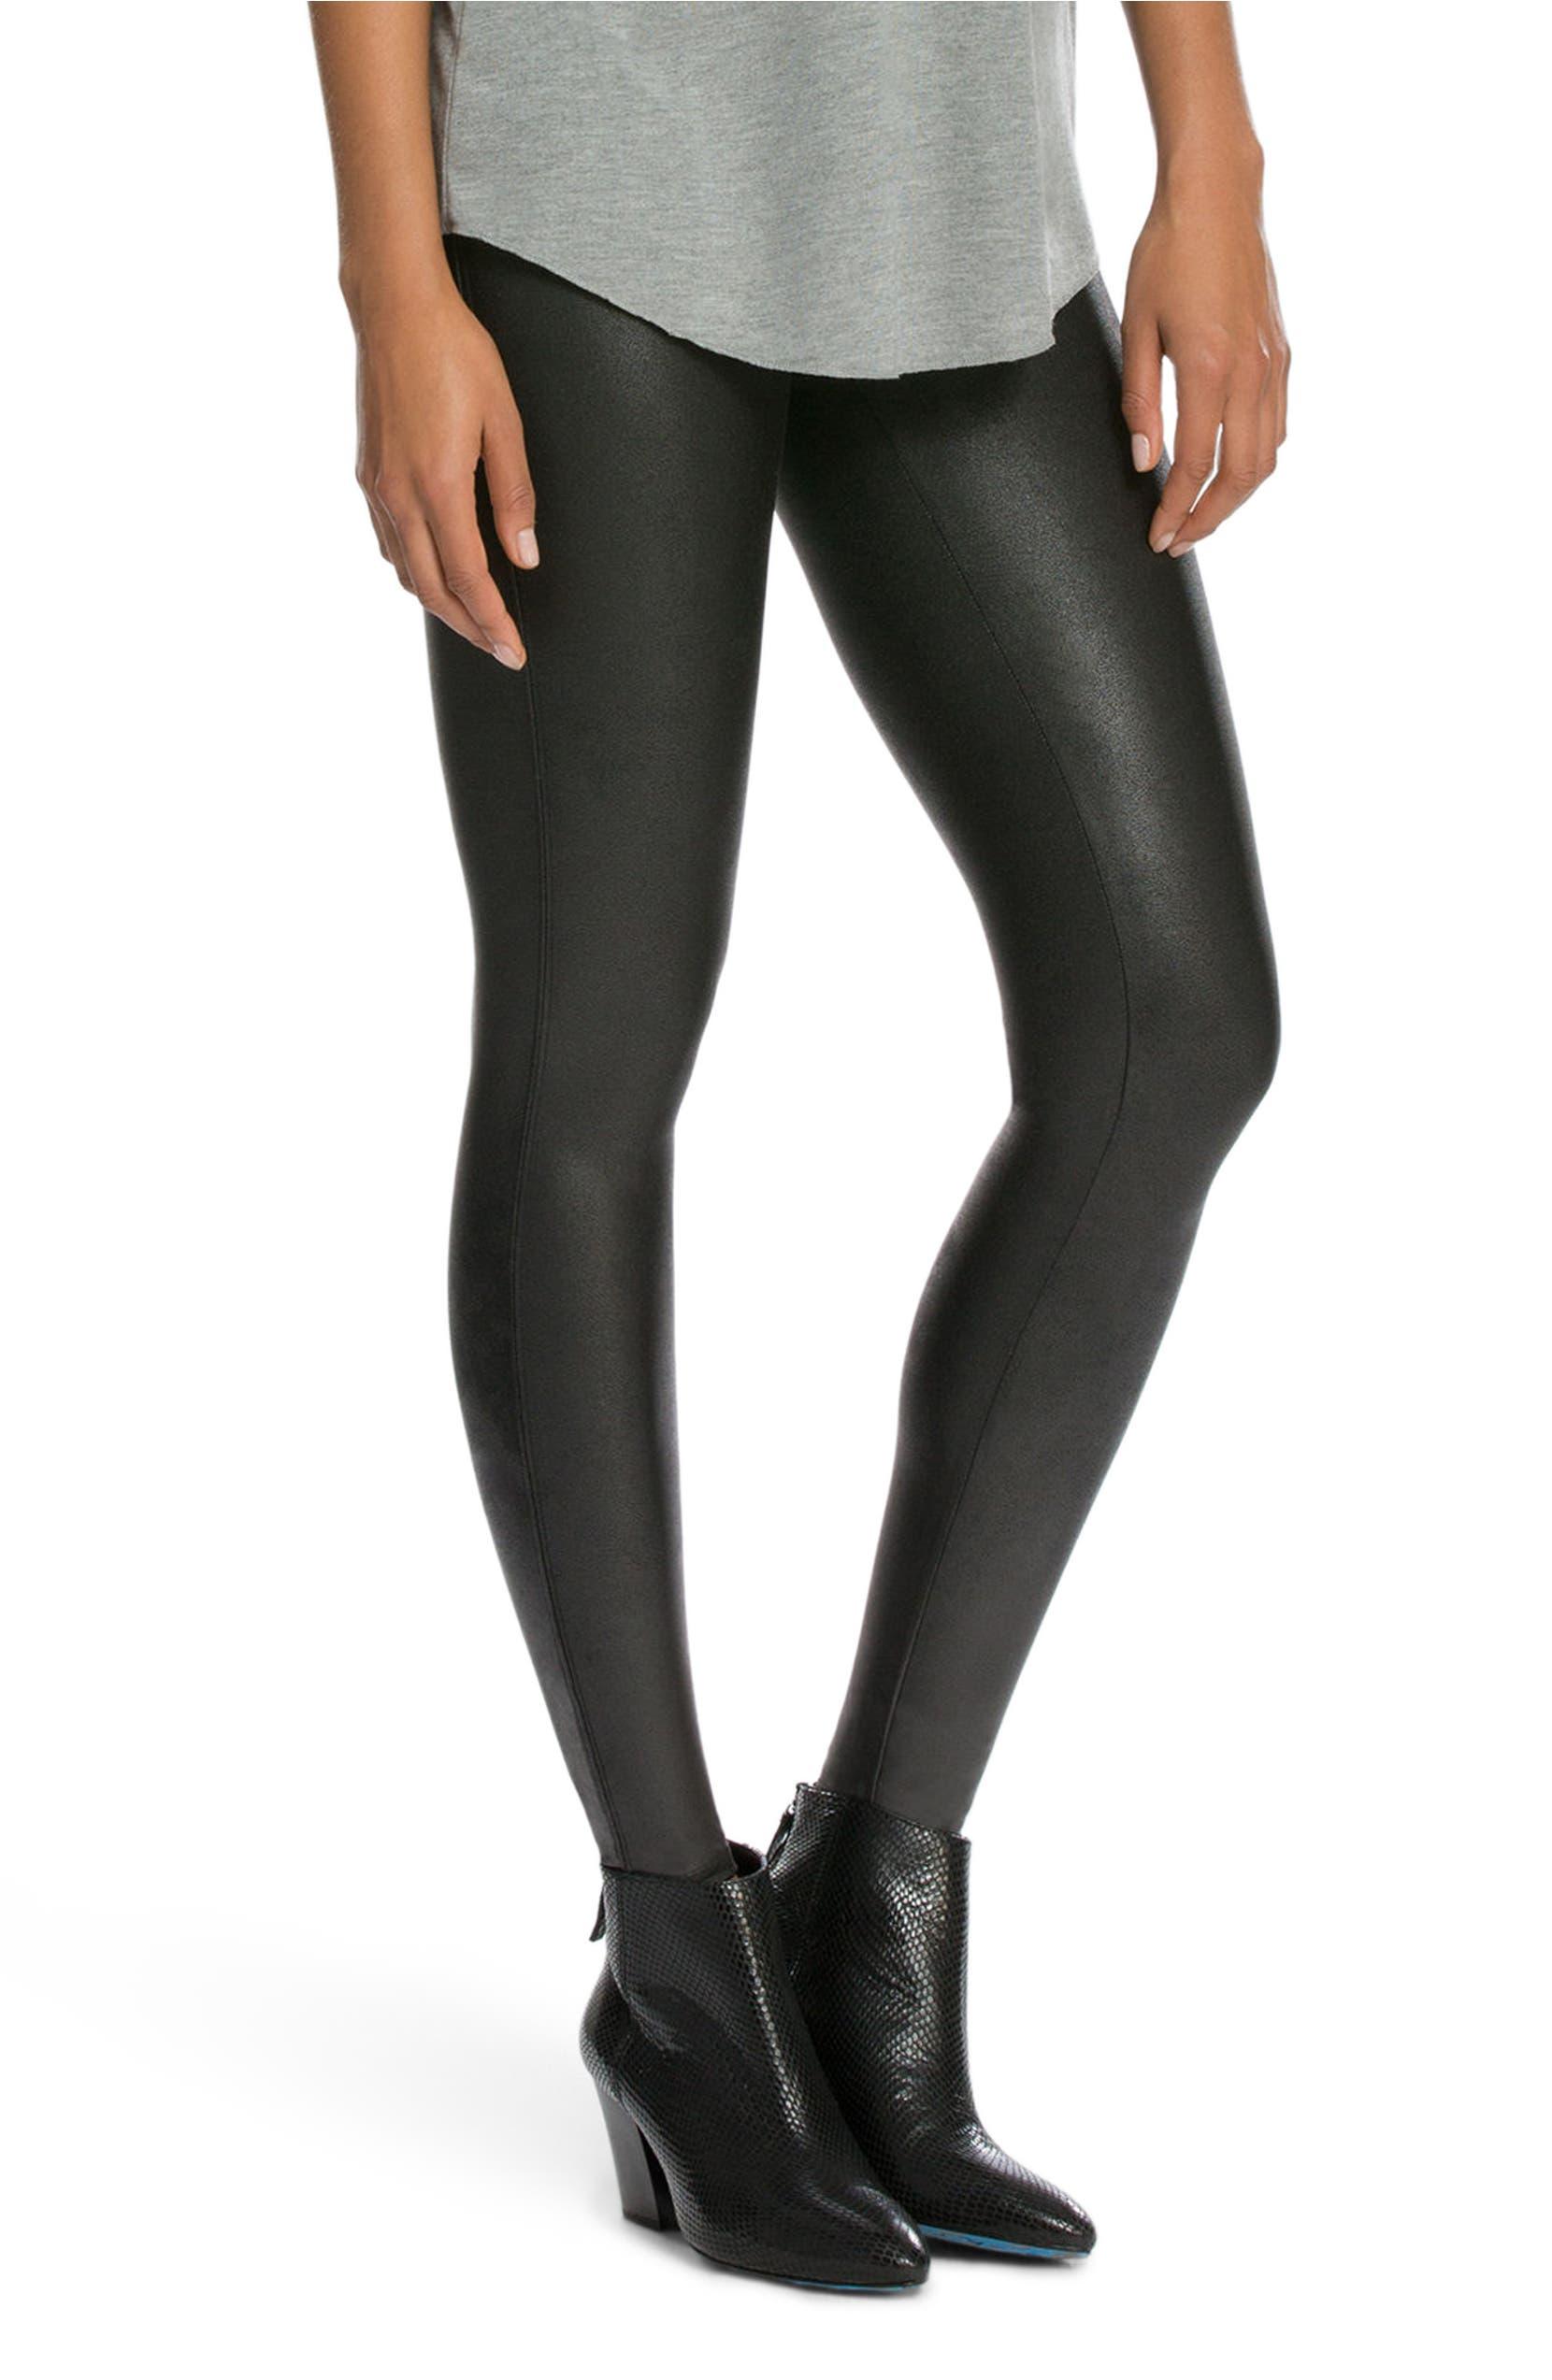 6d9ac876a979 SPANX® Faux Leather Leggings